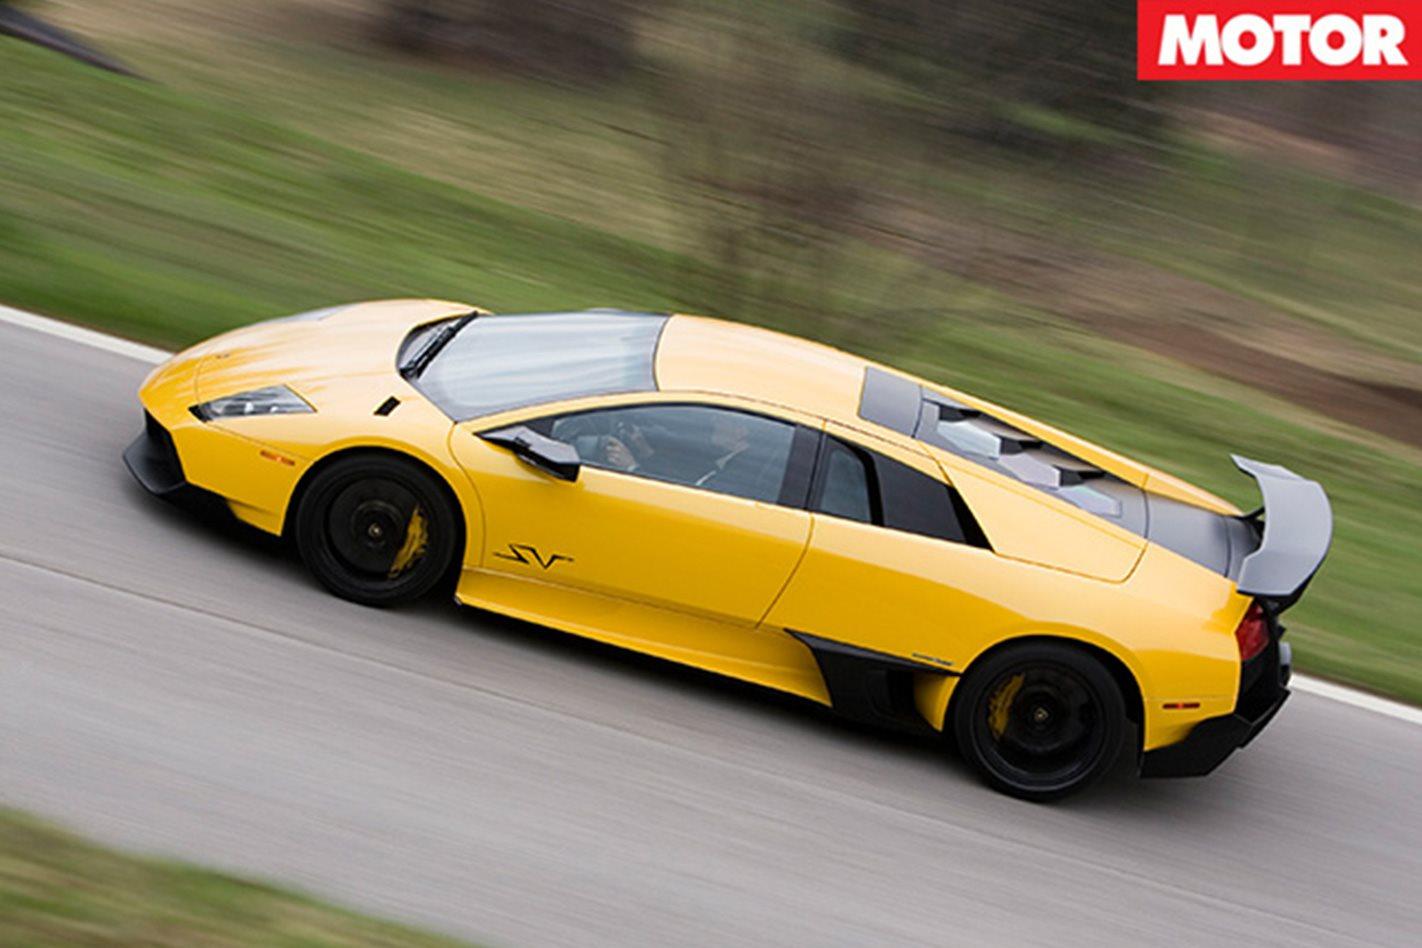 The Rarest Lamborghini Of Them All